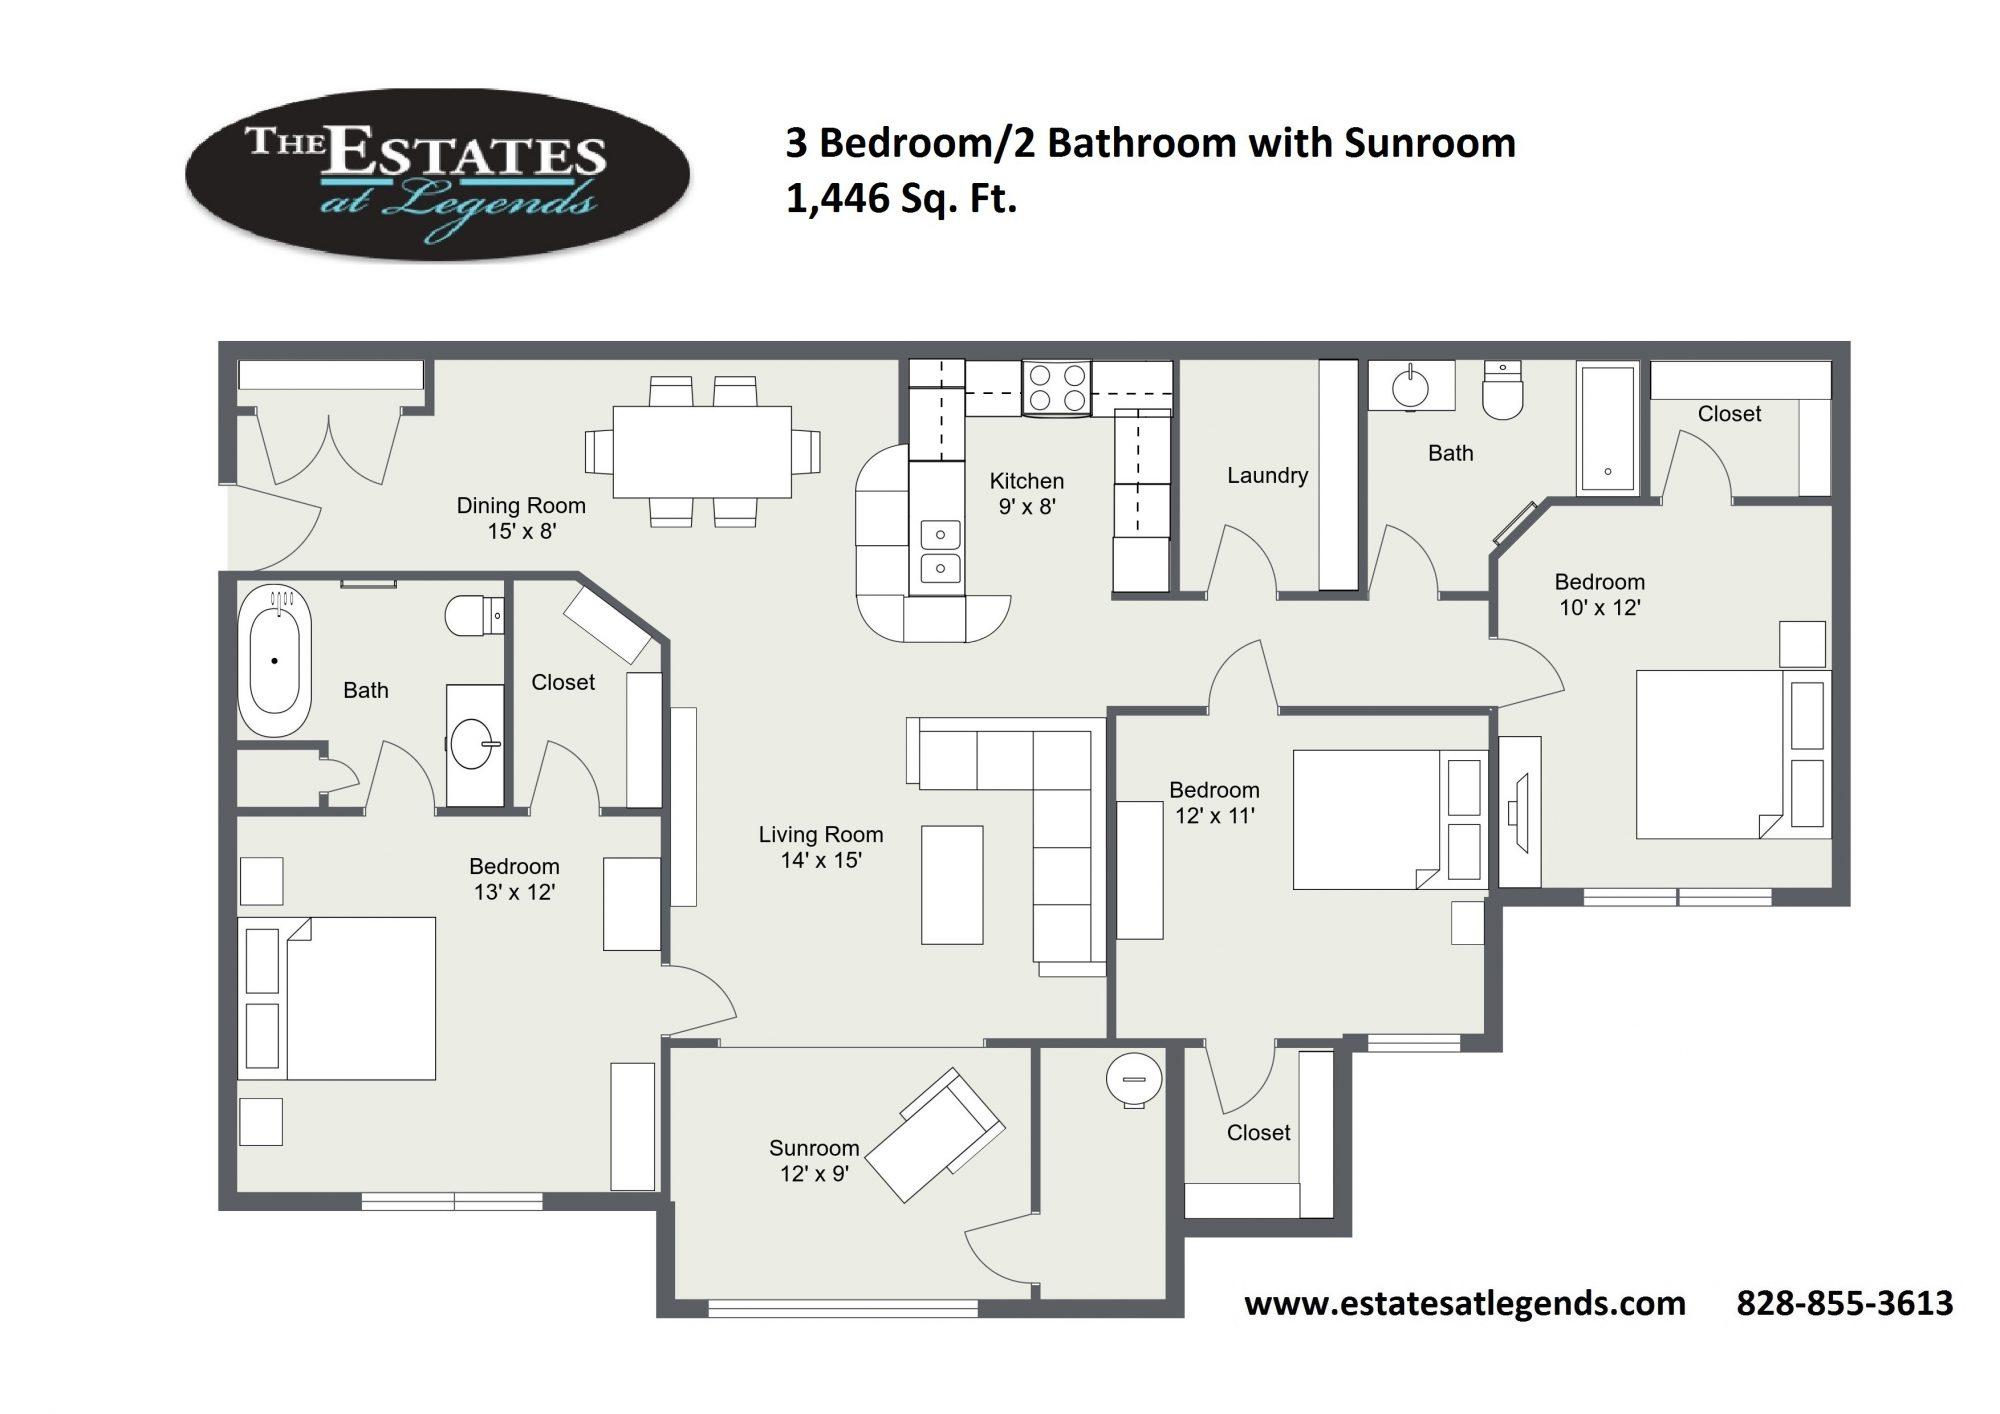 2d - 3 Bedroom 3 Bathroom with Sunroom